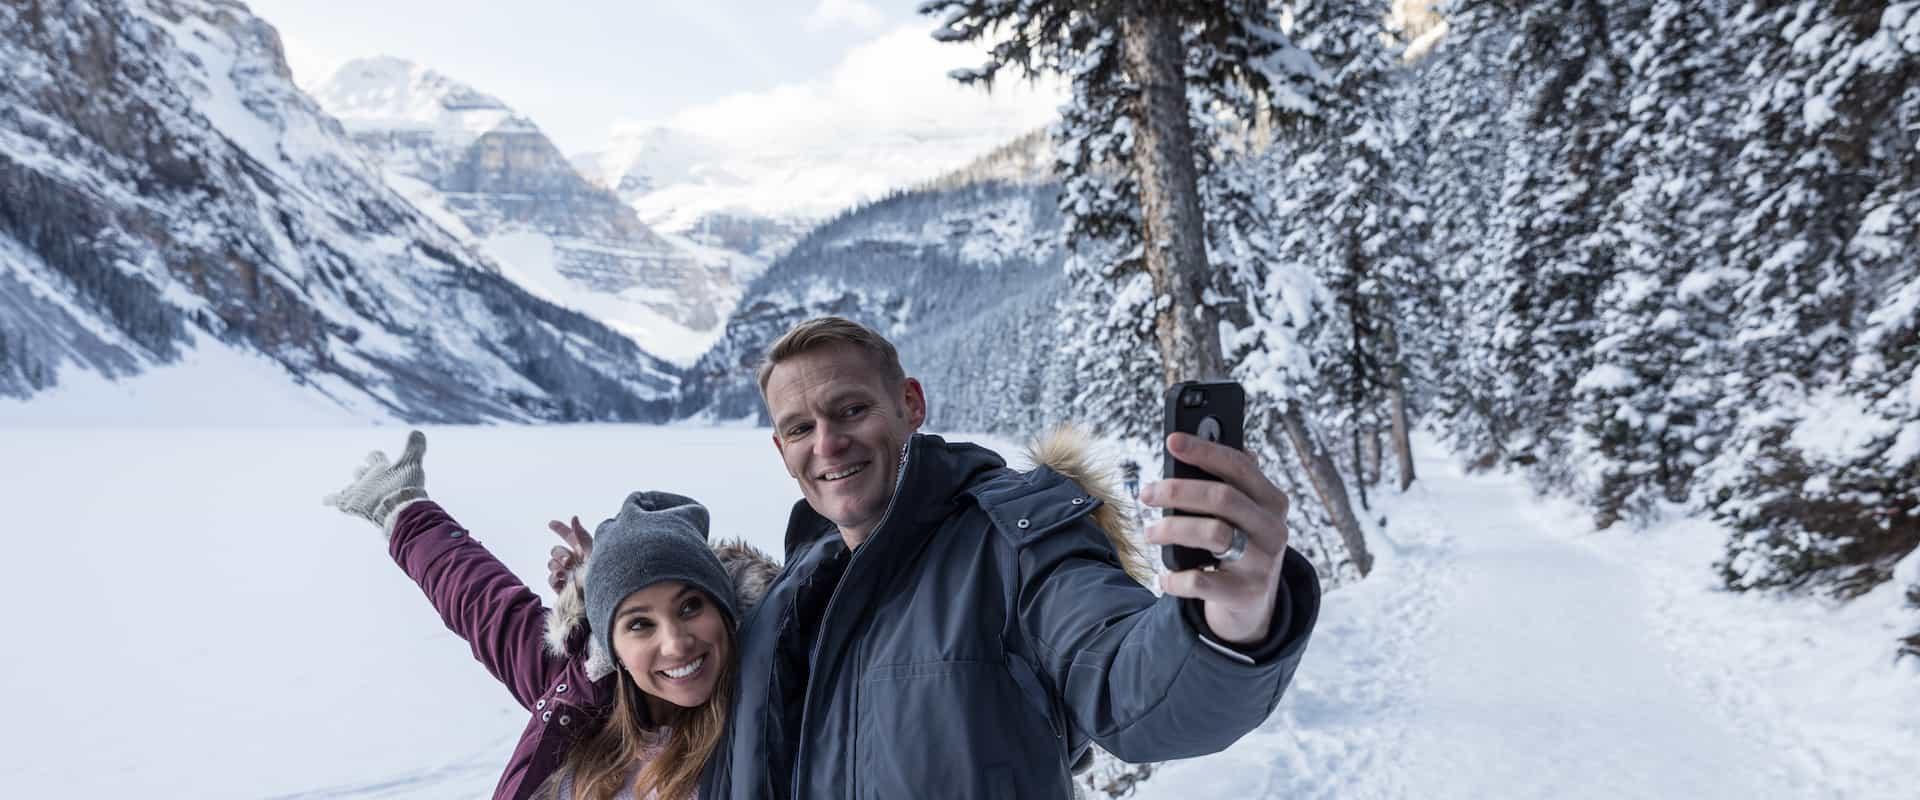 Discover Lake Louise & Snowshoeing